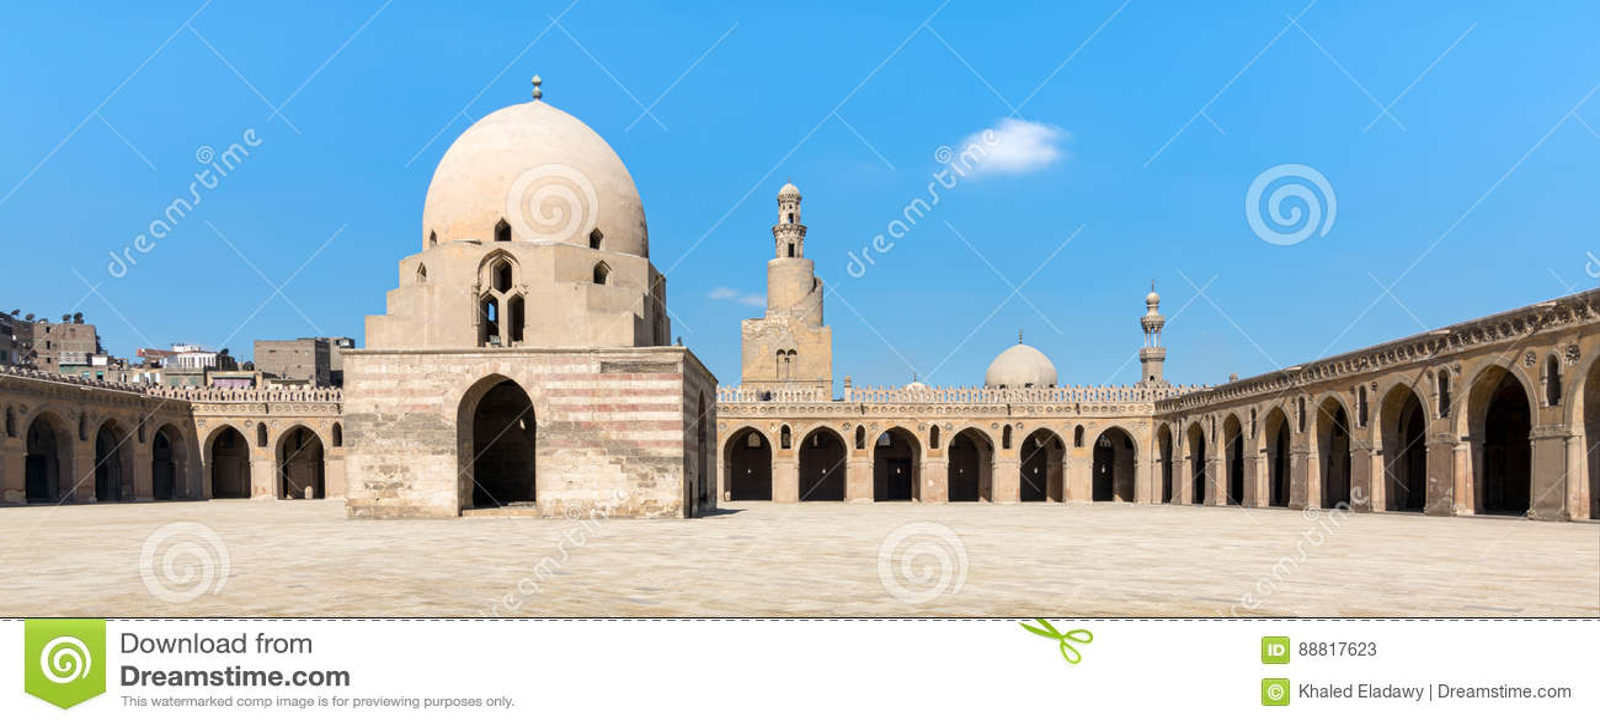 Podwórze Ibn Tulun meczet, Kair, Egipt